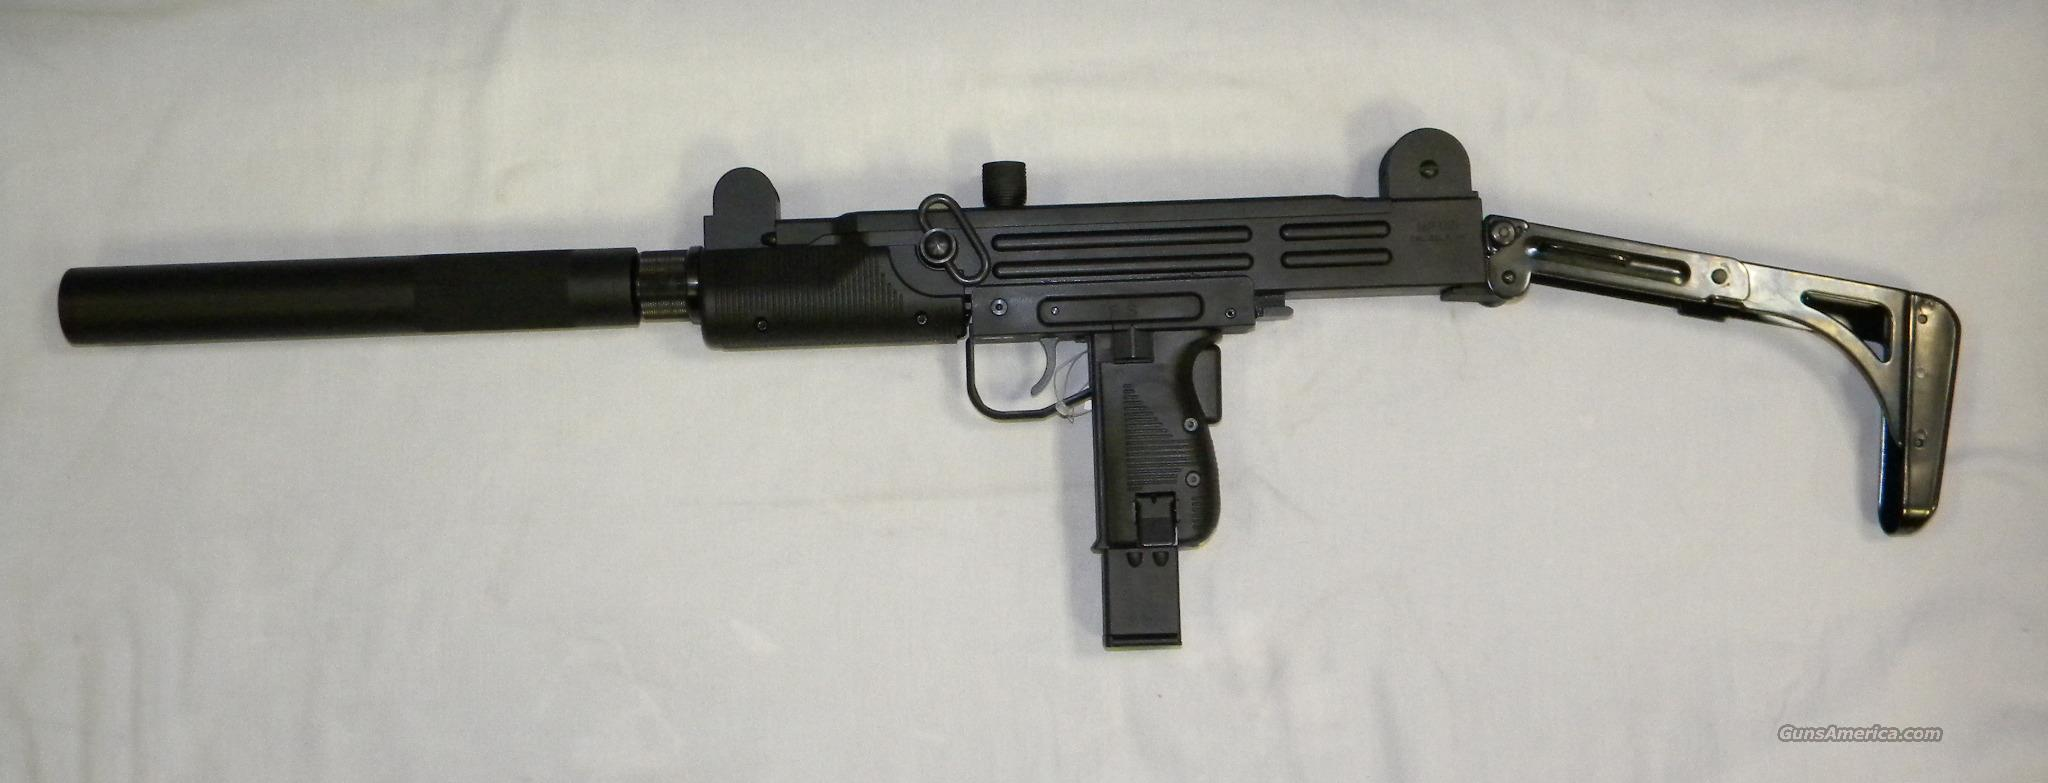 I W I /Walther MP-UZI Rifle,  22 LR